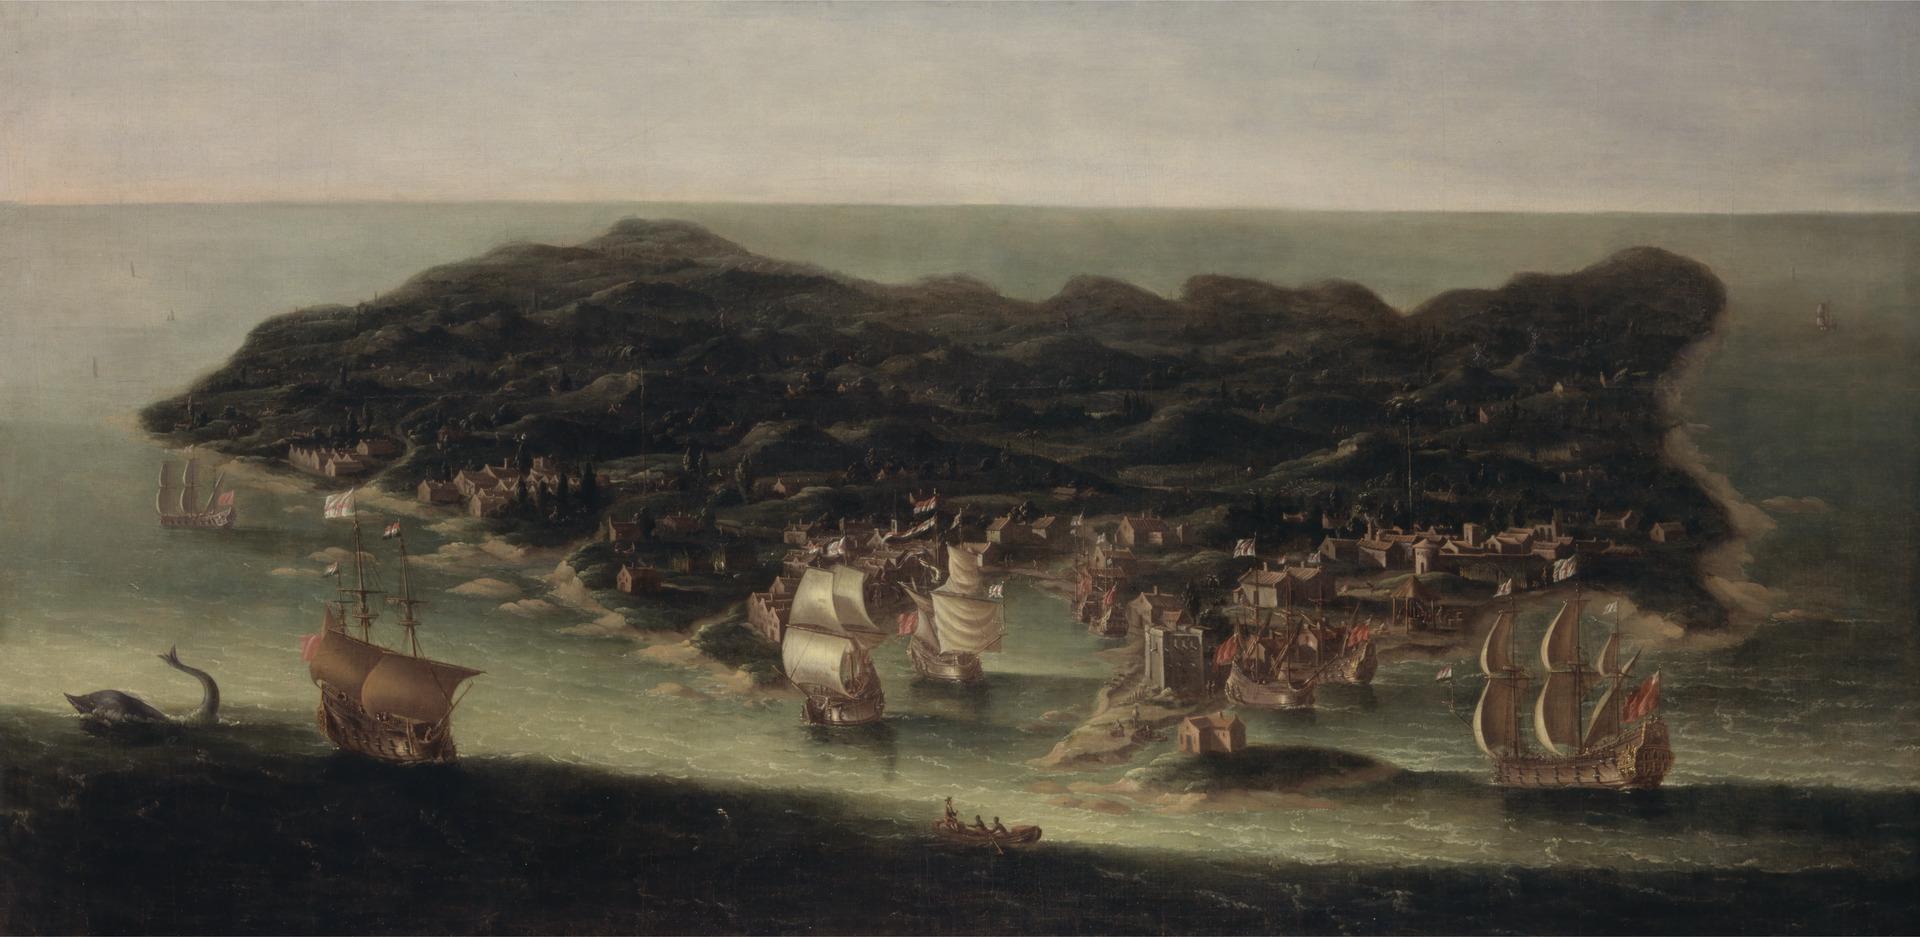 Isaac Sailmaker, ca. 1633-1721. The Island of Barbados. 1694.